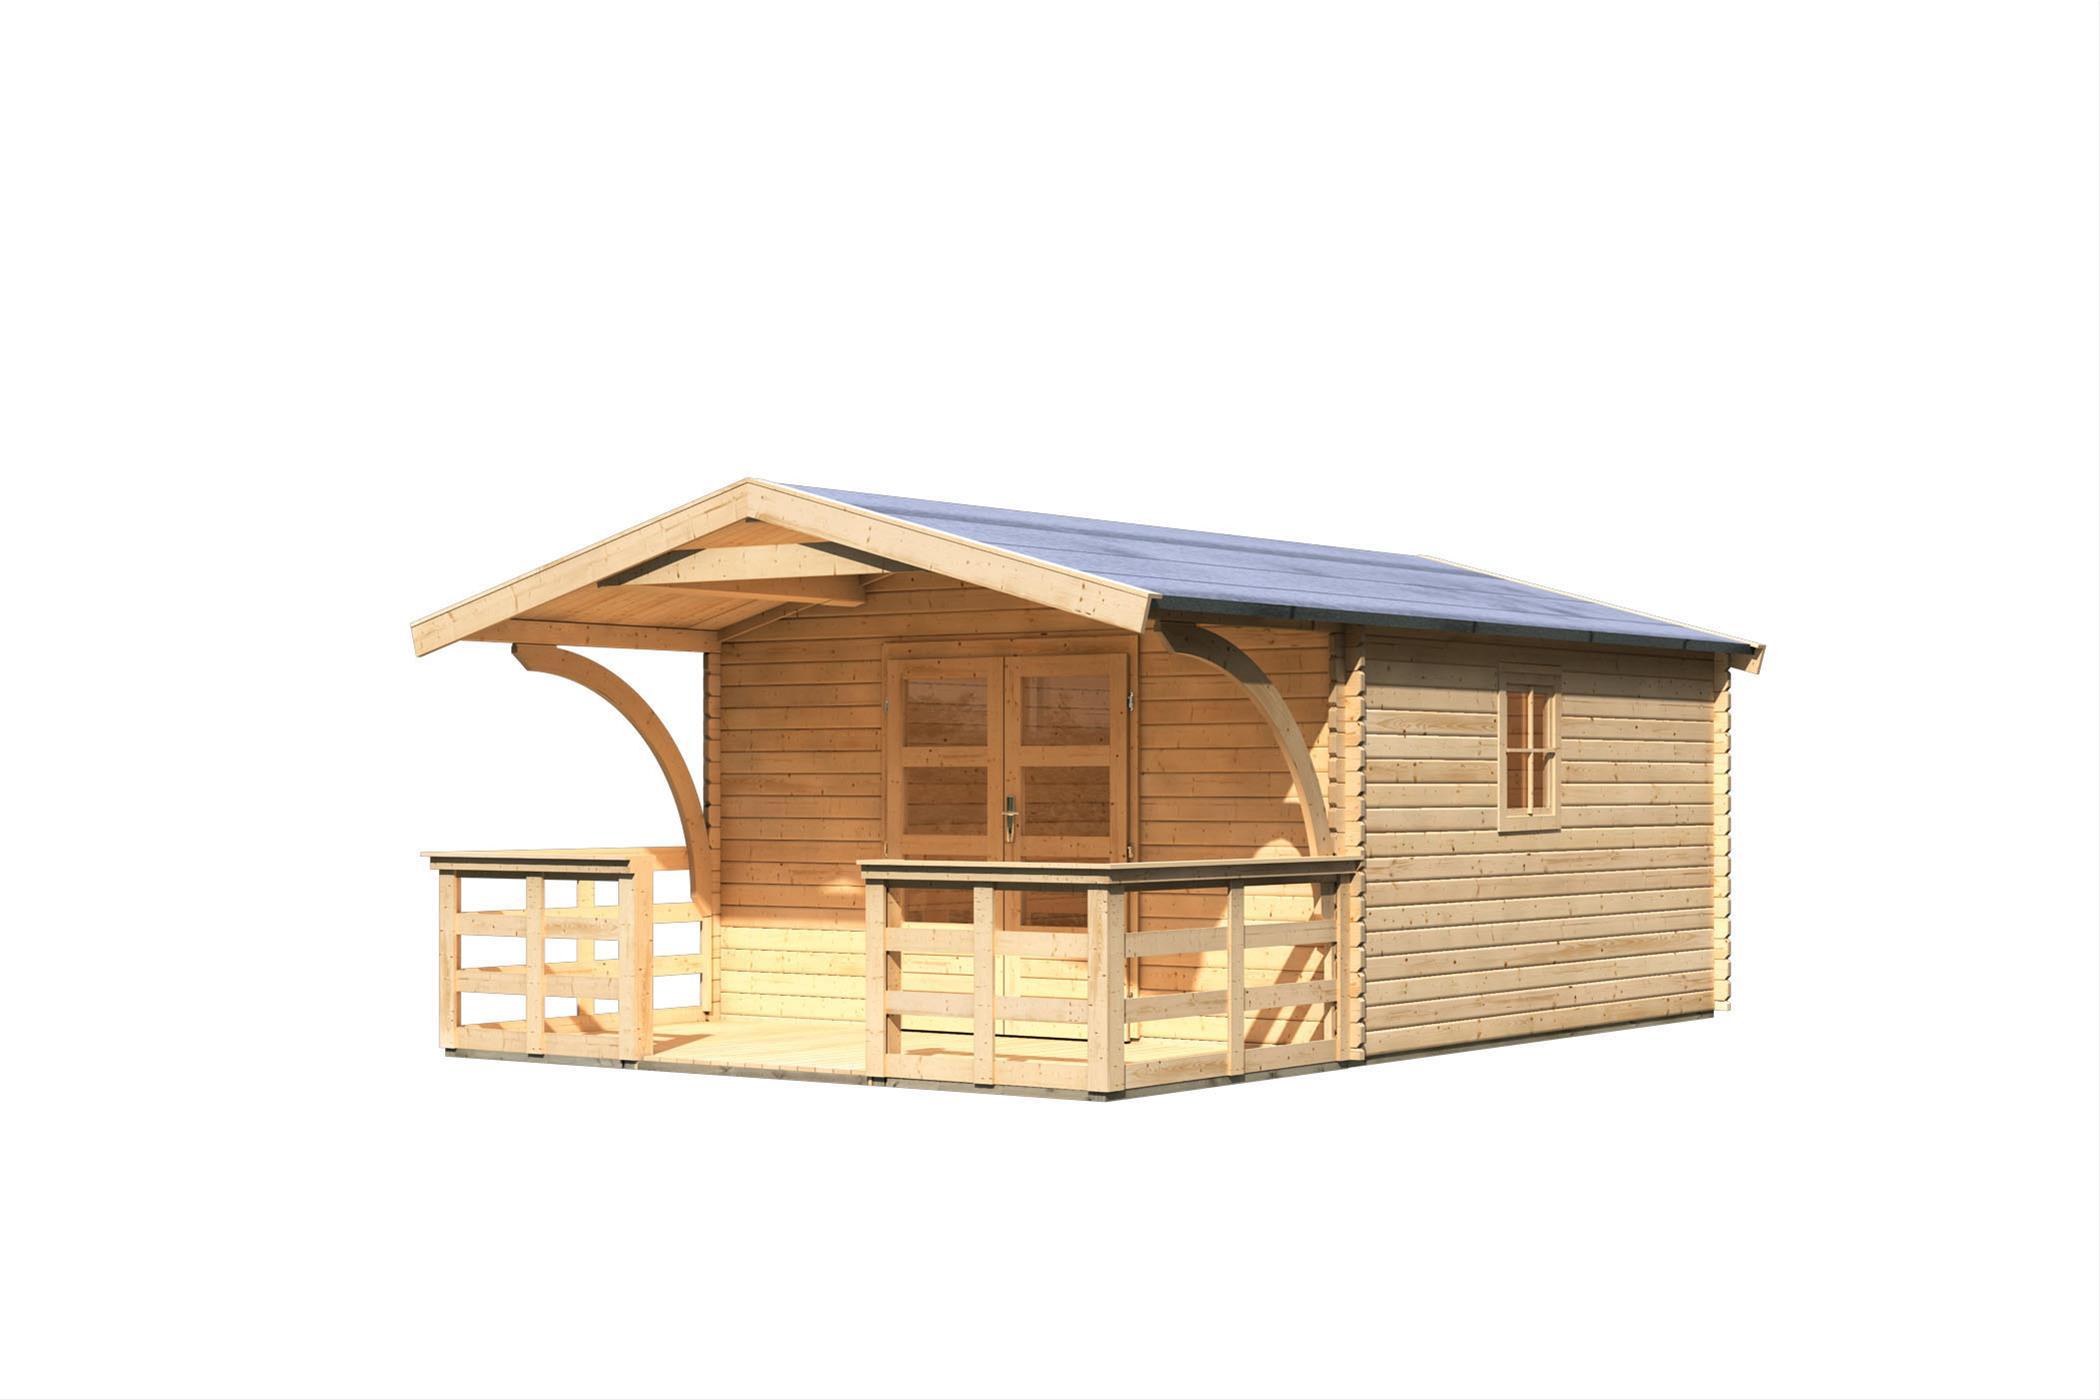 Woodfeeling Gartenhaus 38 mm Meldorf 6 VD+Terrasse natur 404x590cm Bild 3